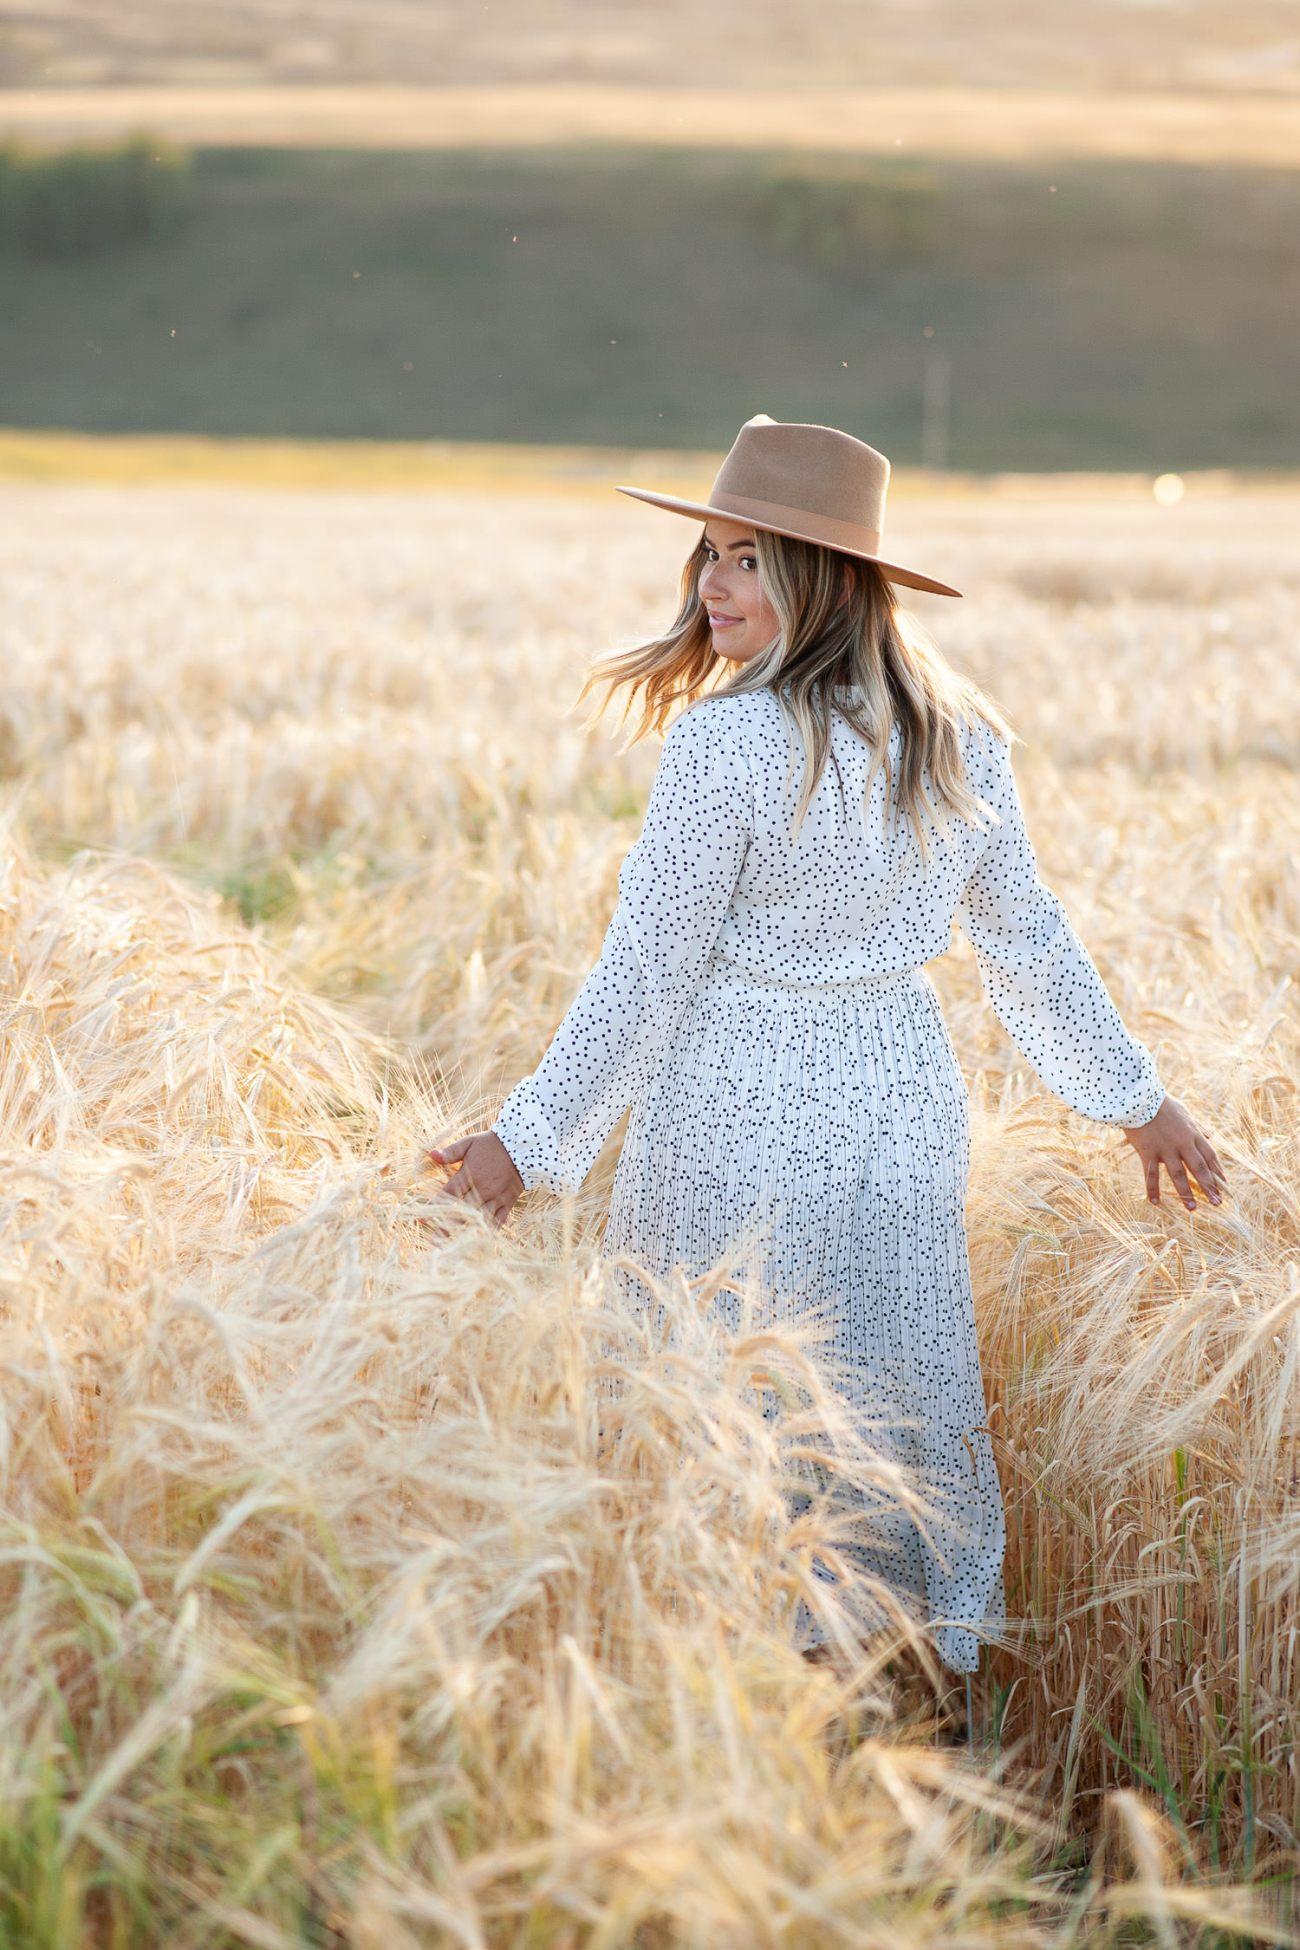 bride walks through a field of barley captured by Tara Whittaker Photography